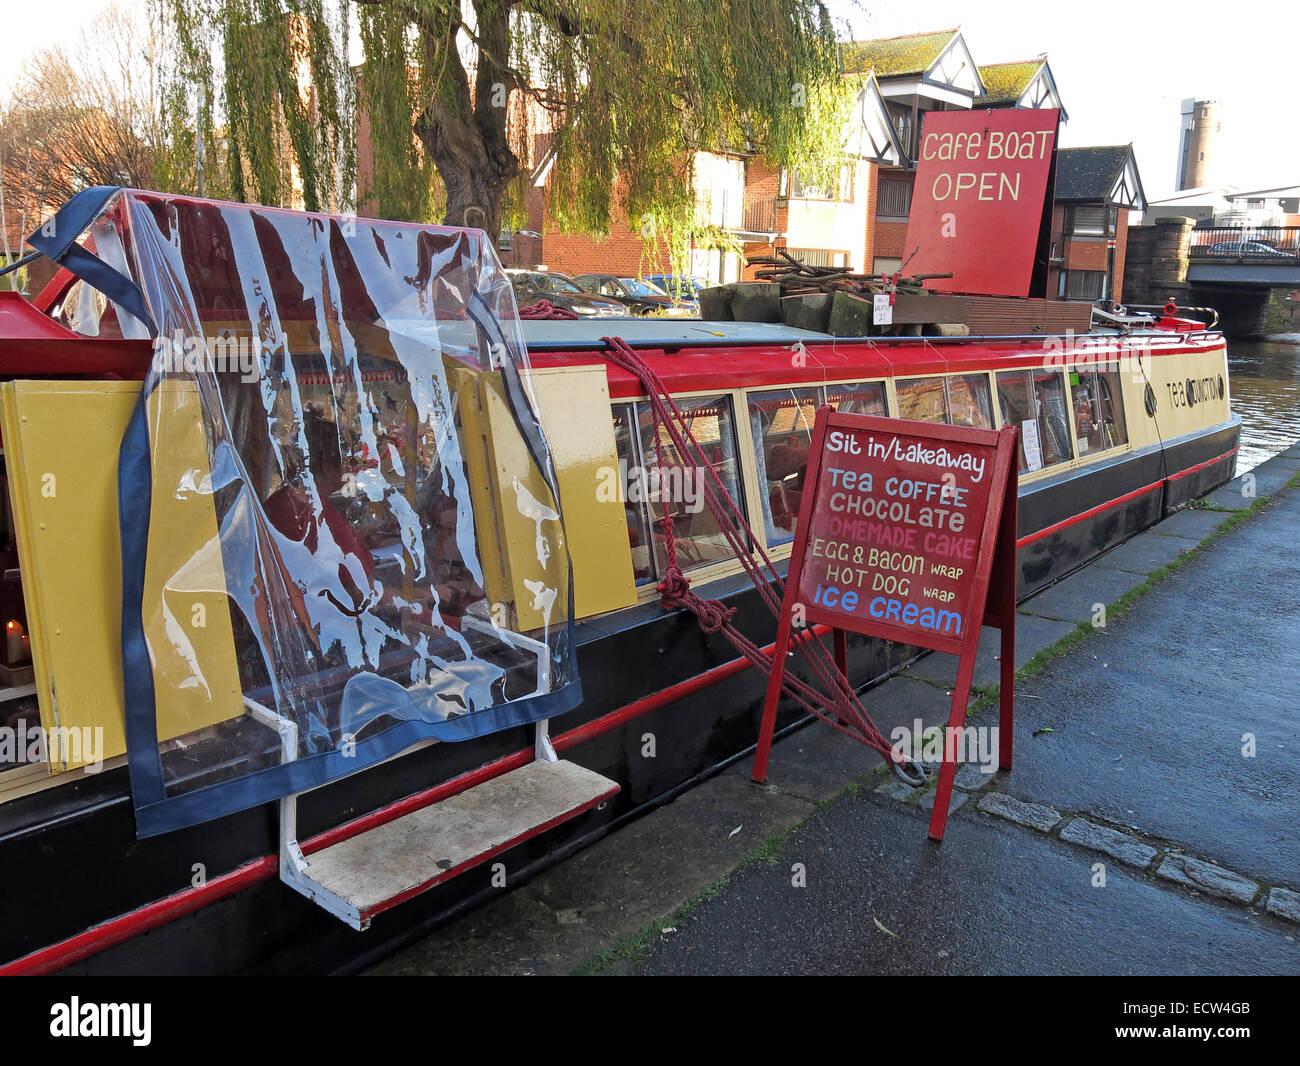 Laden Sie dieses Alamy Stockfoto Kanal Cafe Narrowboat, Chester, Cheshire, England, UK - ECW4GB